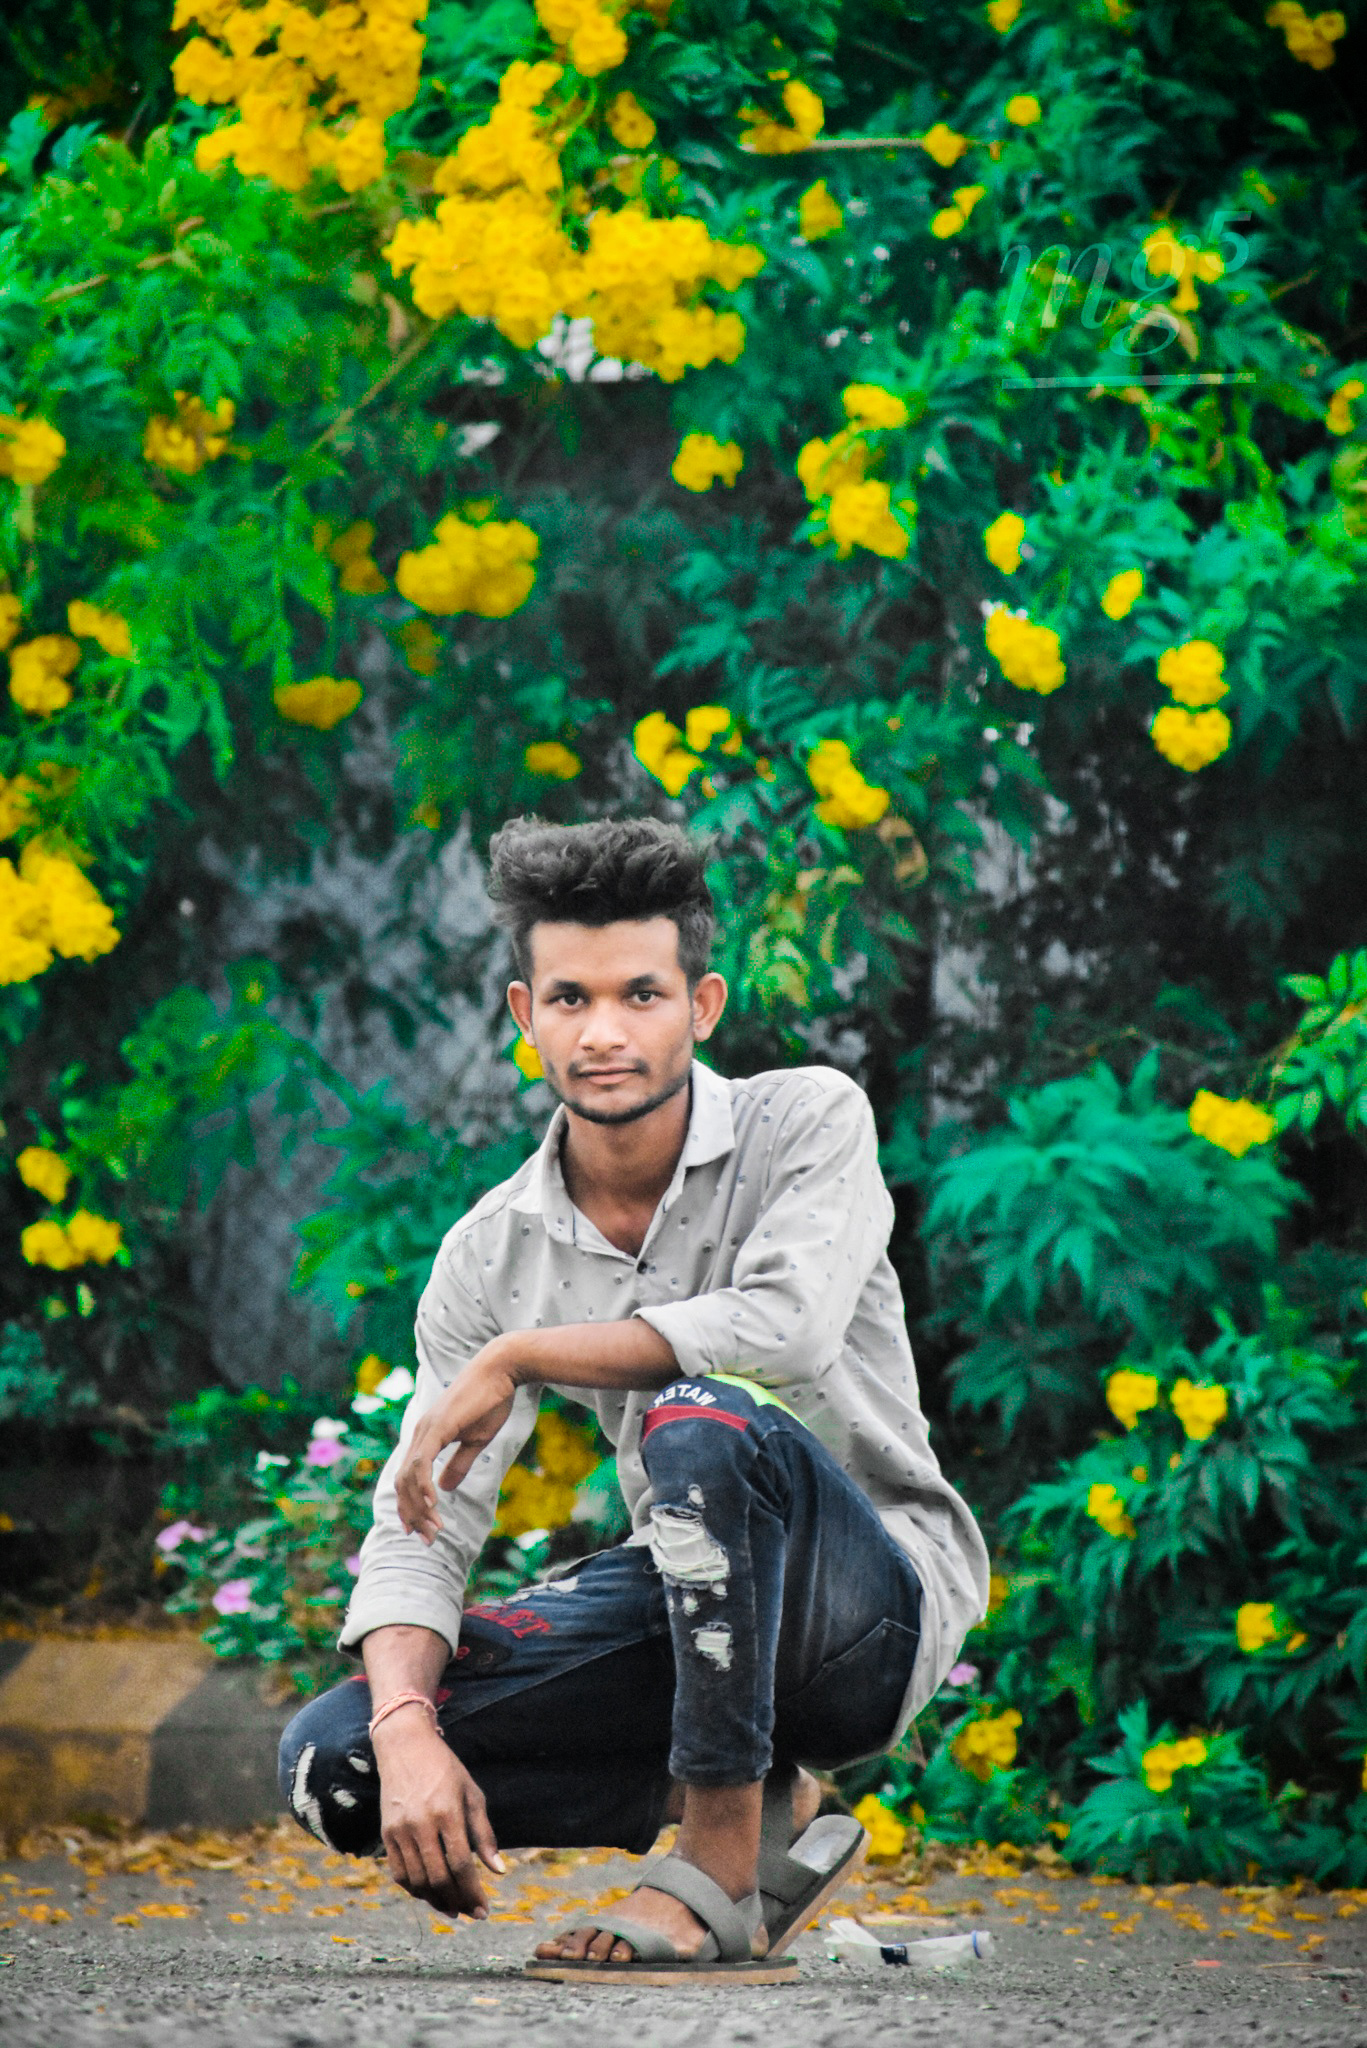 Portrait of a boy sitting in a garden